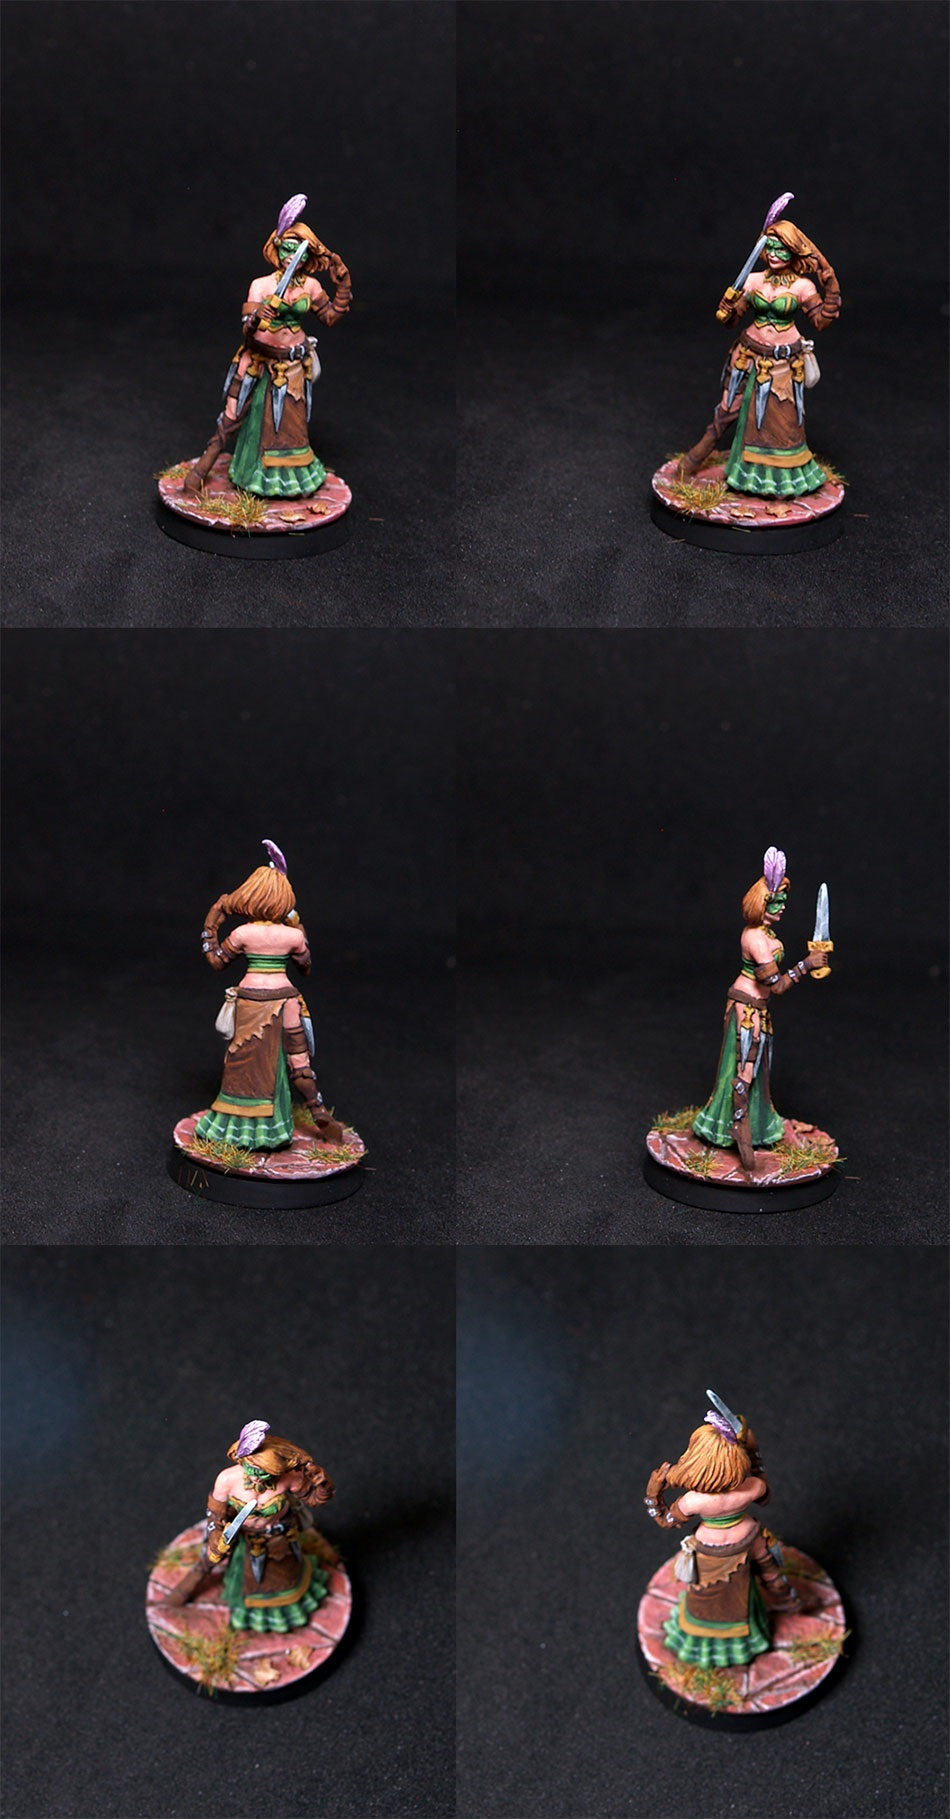 Bombshell Miniatures Elizabeth Beckford - Assassin